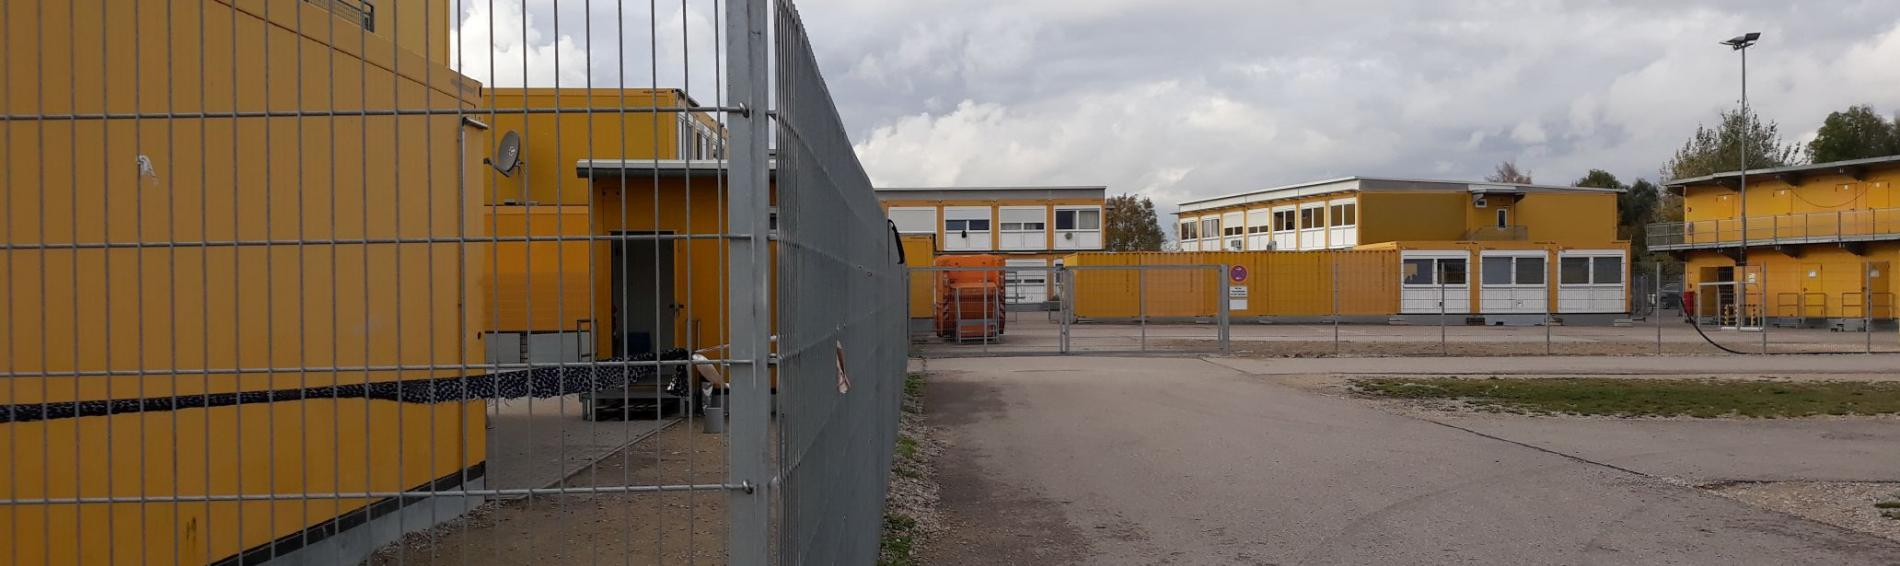 Ankerzentrum. Foto: Bayerischer Flüchtlingsrat